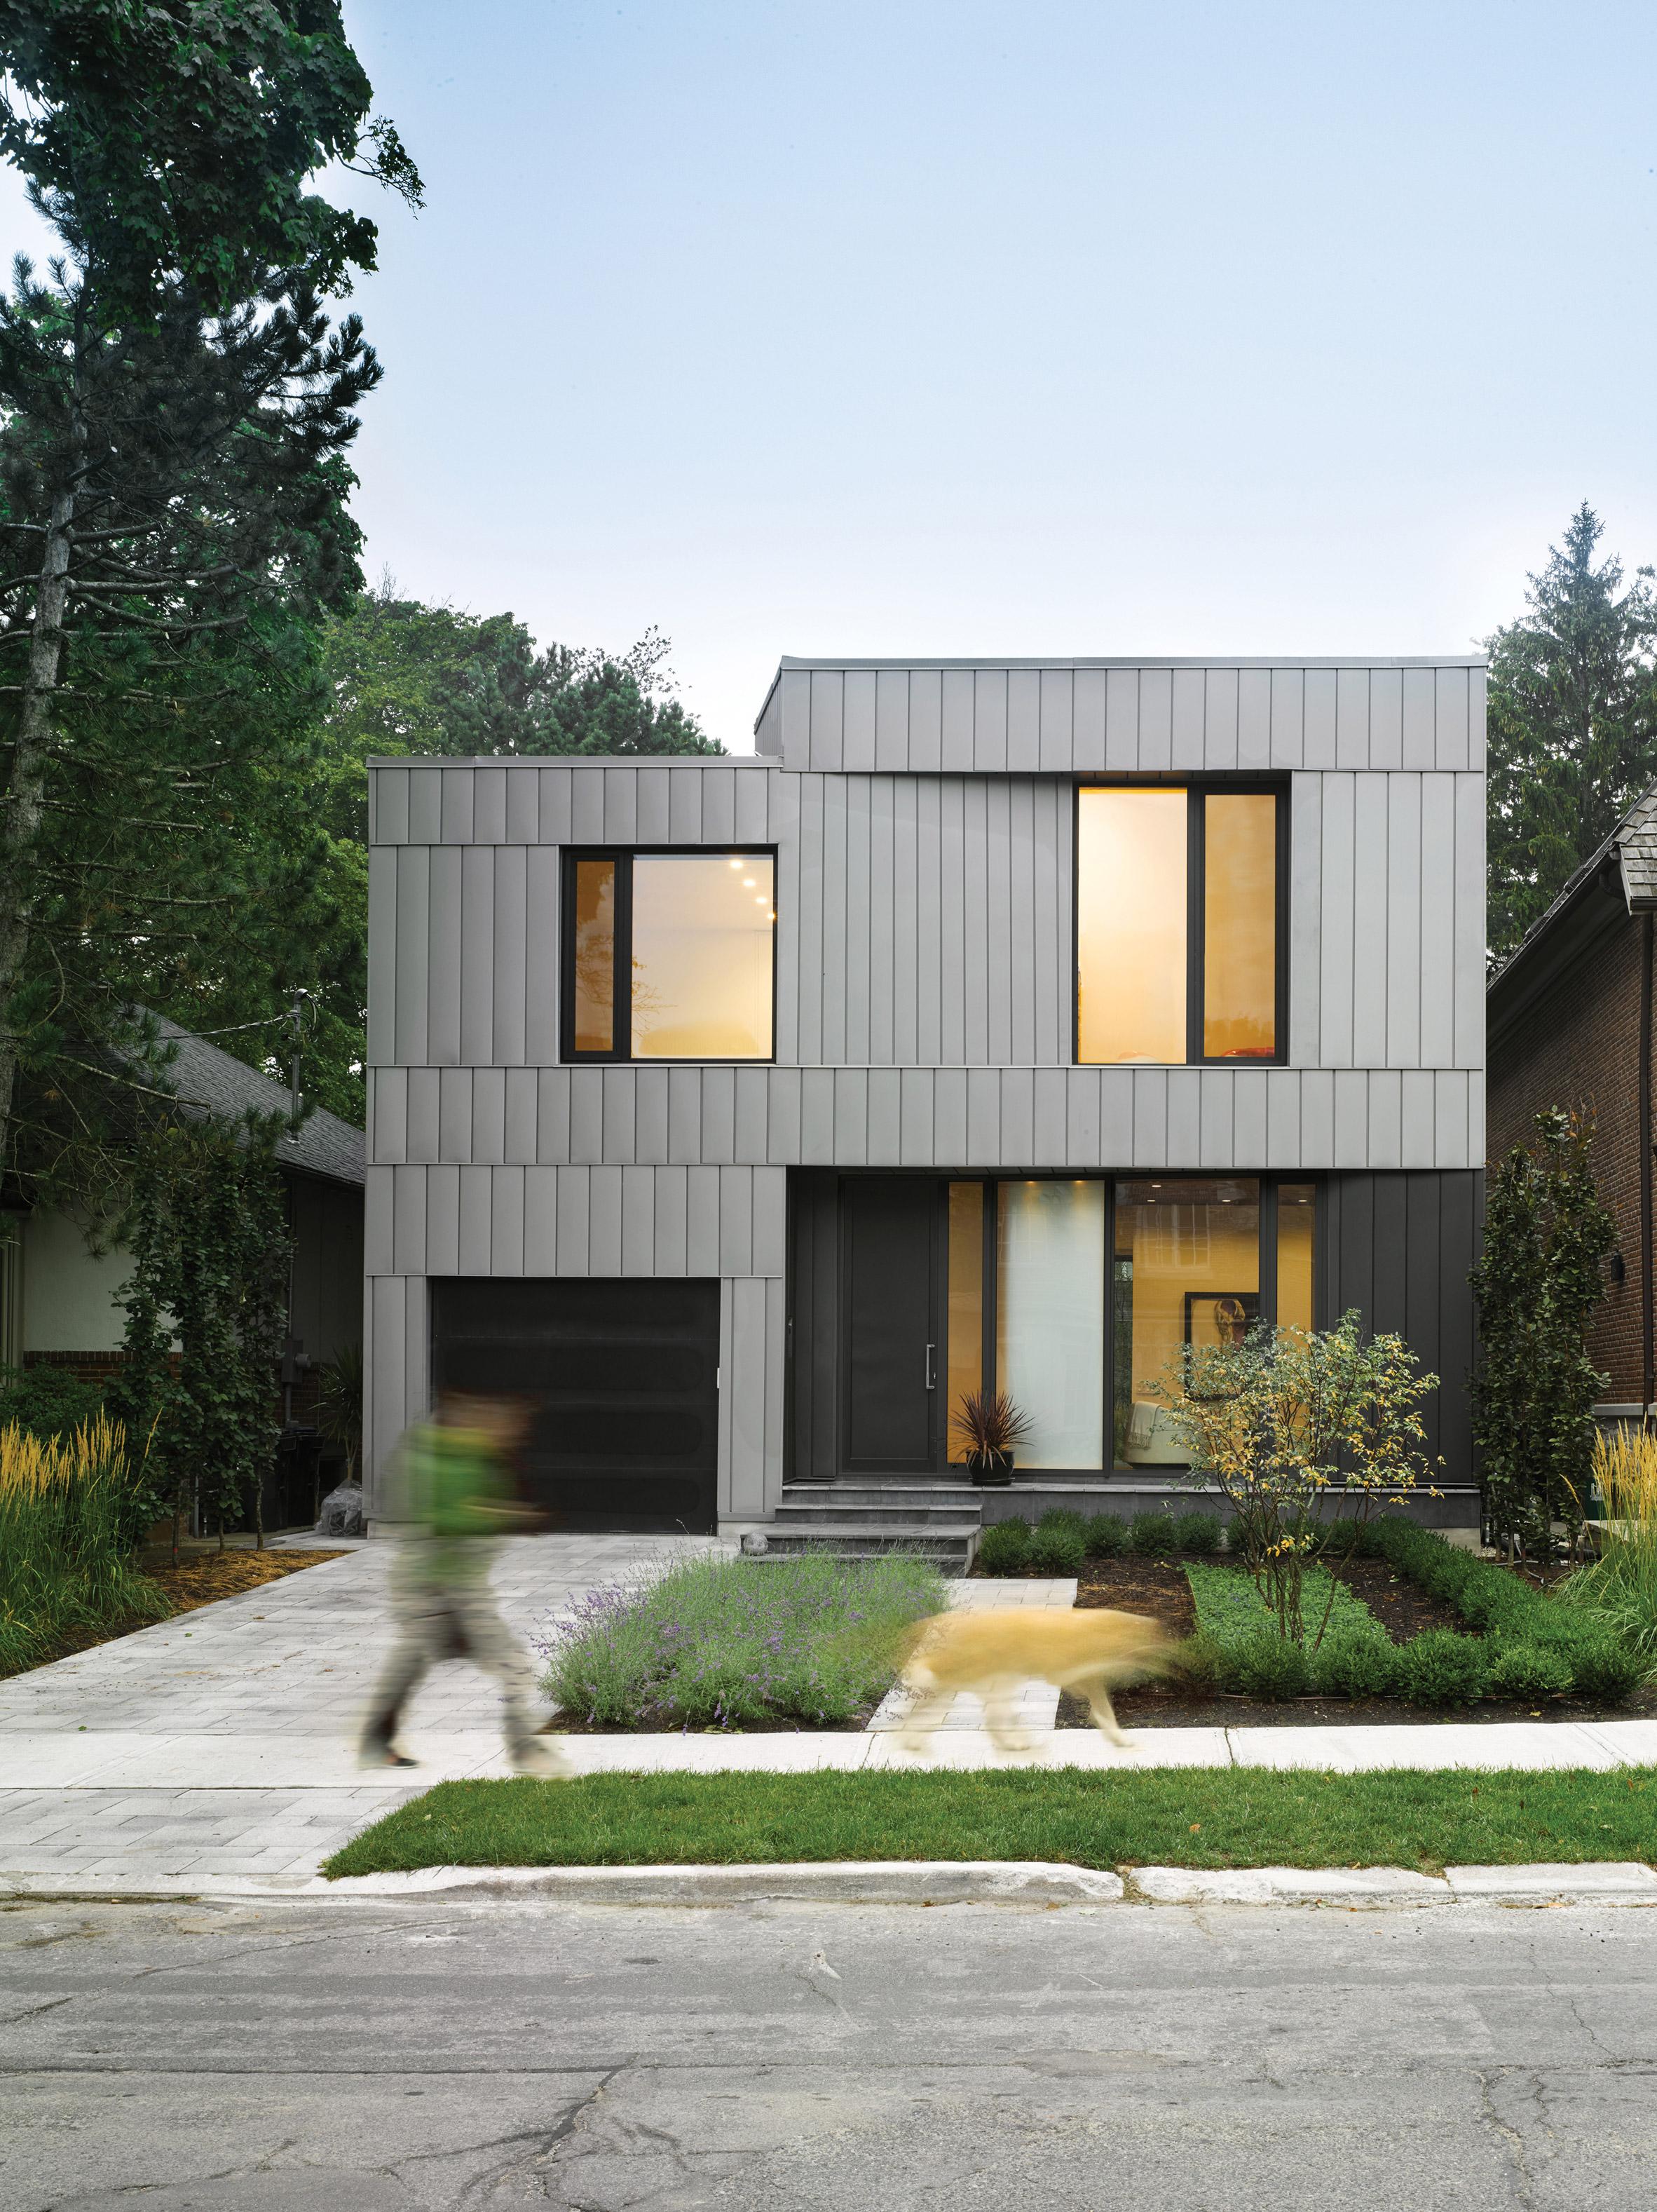 Kaleidoscope House by Paul Raff Studio